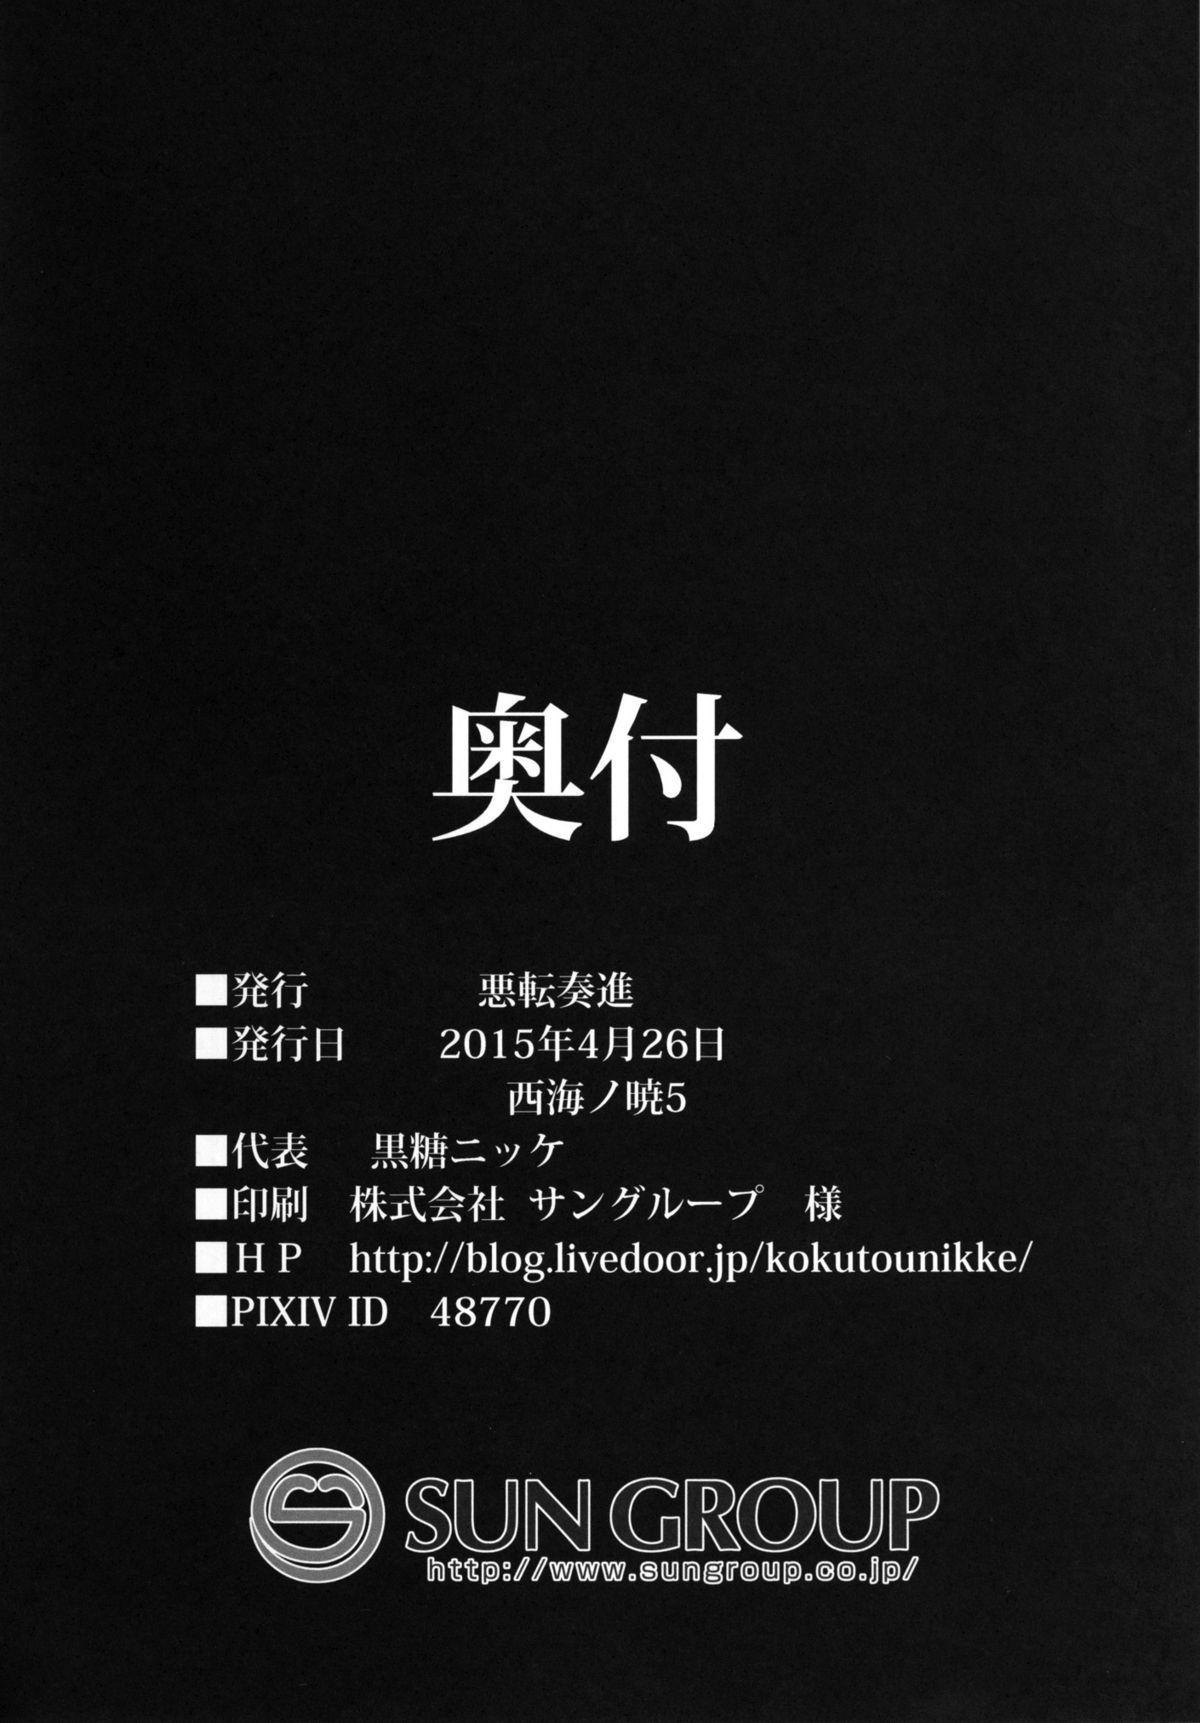 [Akuten Soushin (Kokutou Nikke)] Kanmusu Chakunin Zenya - Akatsuki Ryoujoku Enkai Rinkan   Eve of Ship Girls Pregnancy - Akatsuki's Gang Rape Banquet (Kantai Collection -KanColle-) [English] [Digital] 24